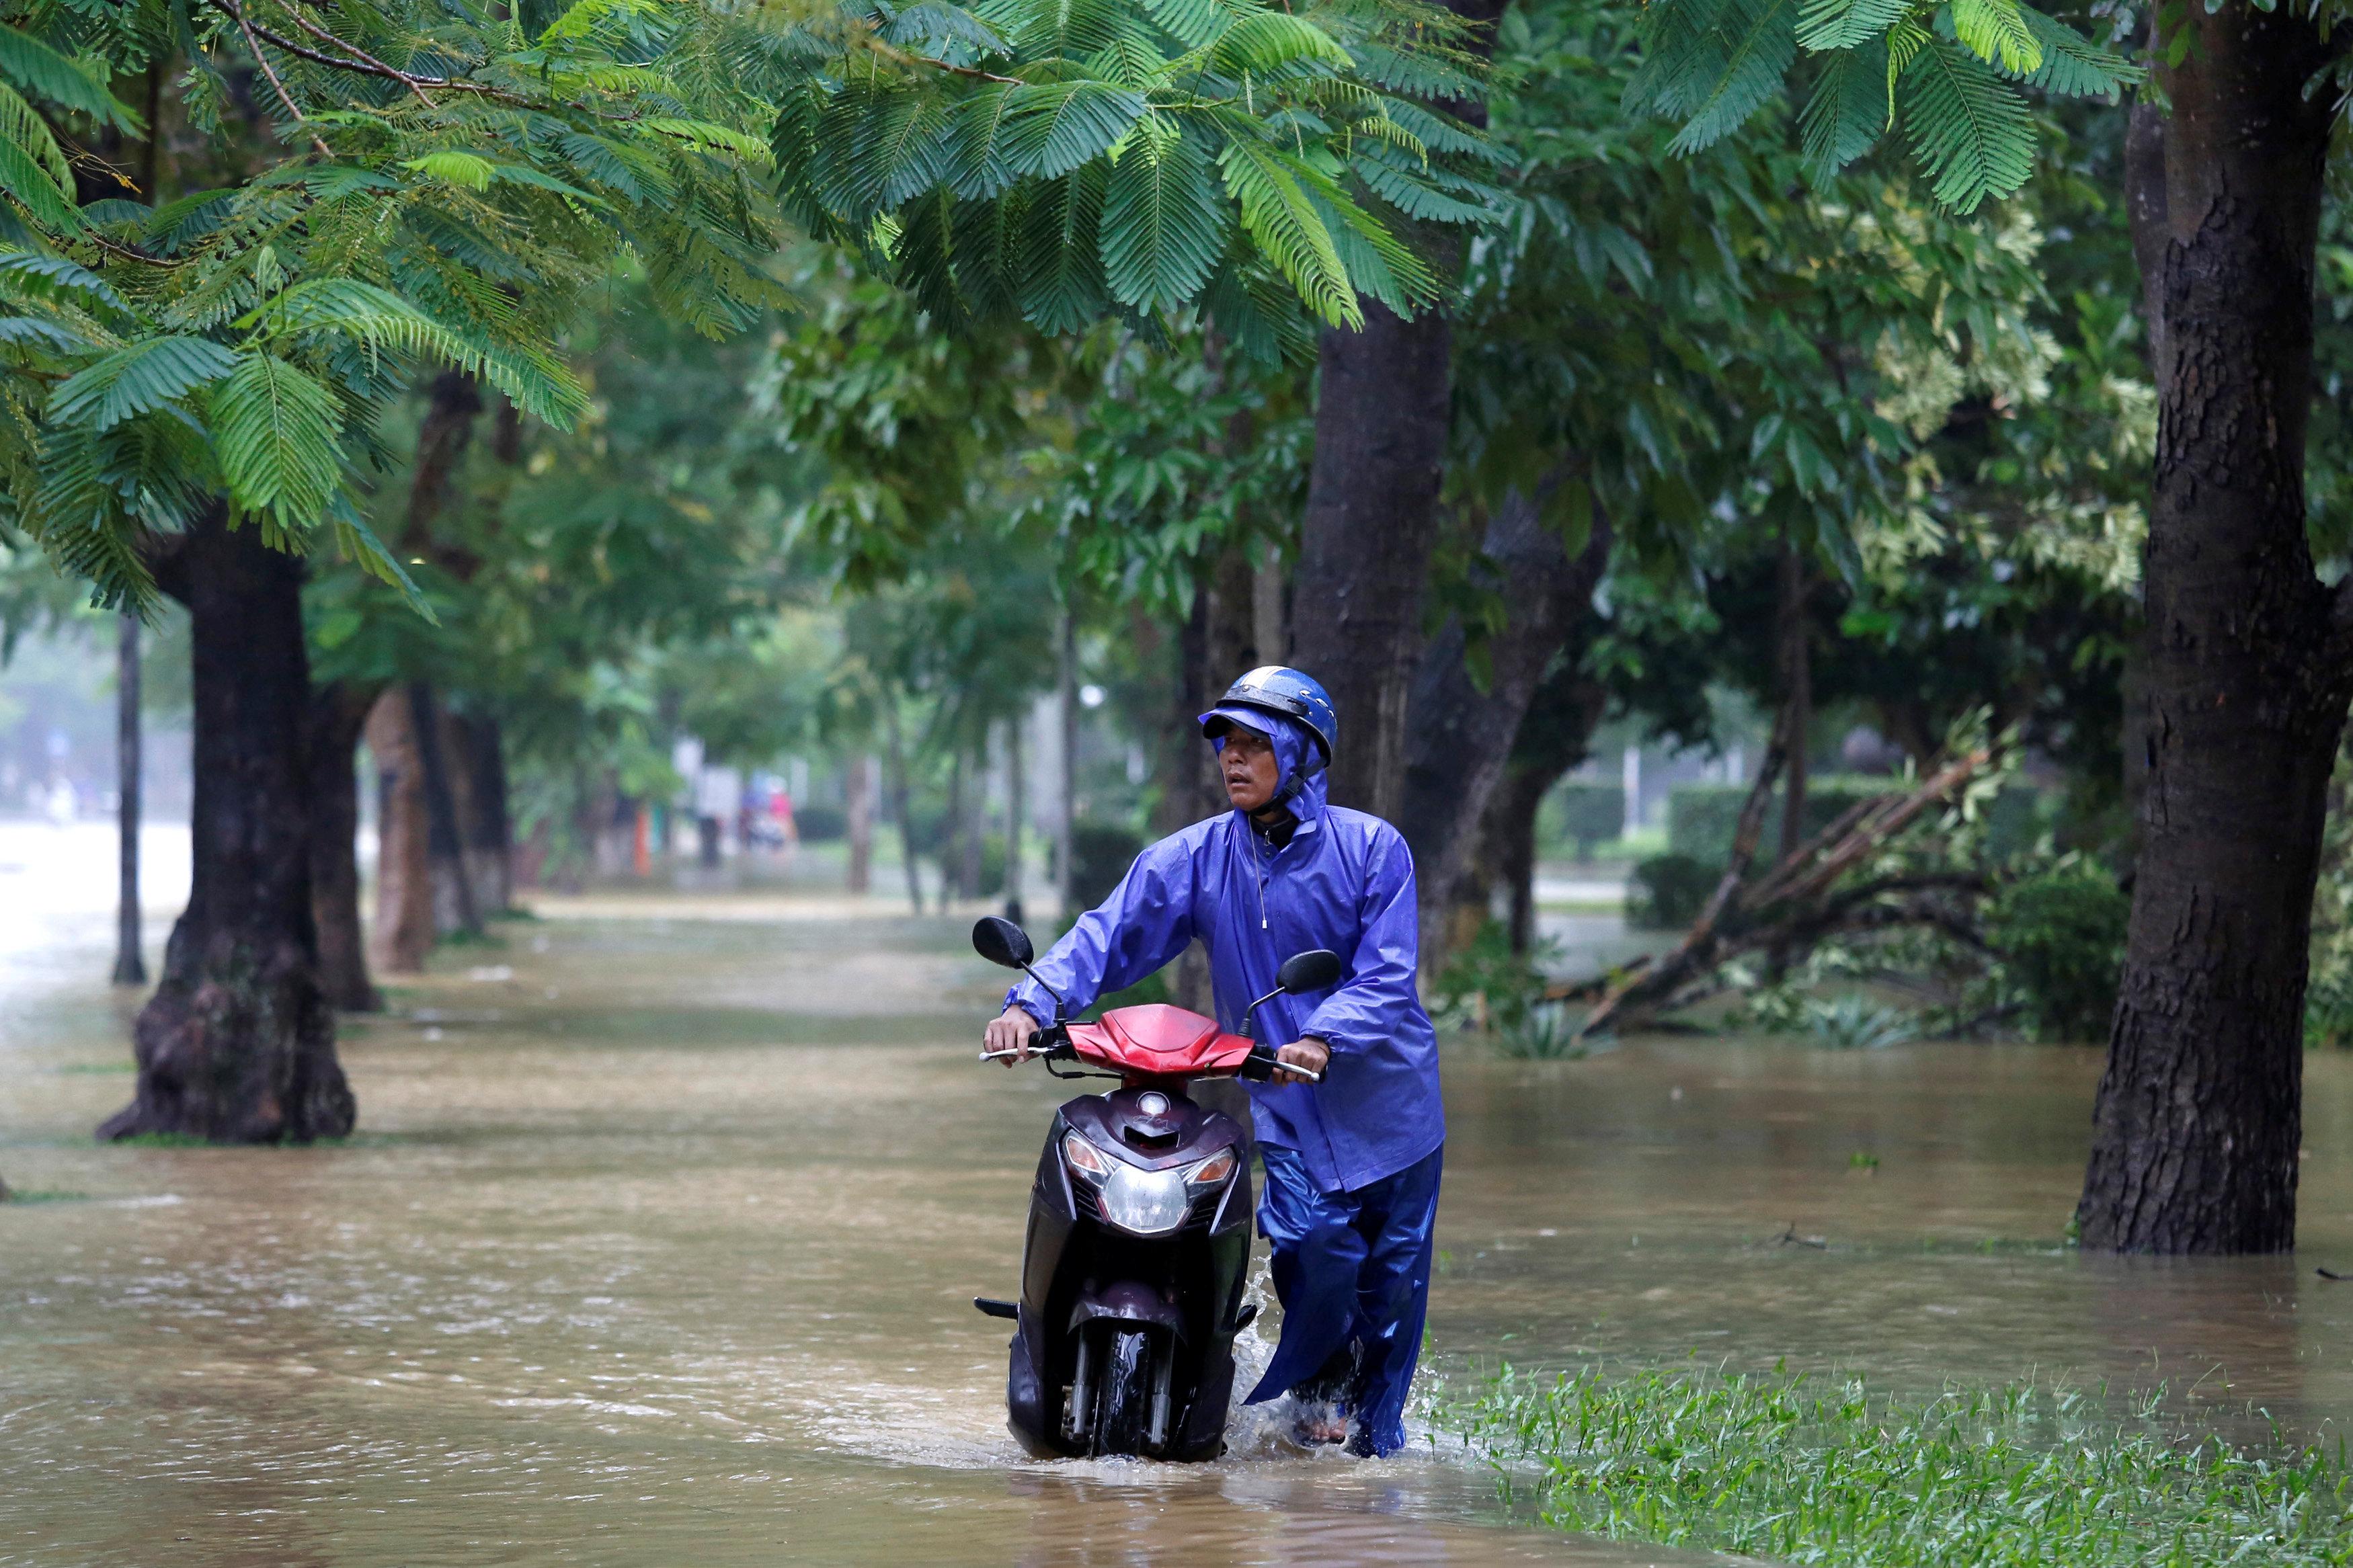 Floods swamp Vietnam as Typhoon Damrey death toll rises to 27